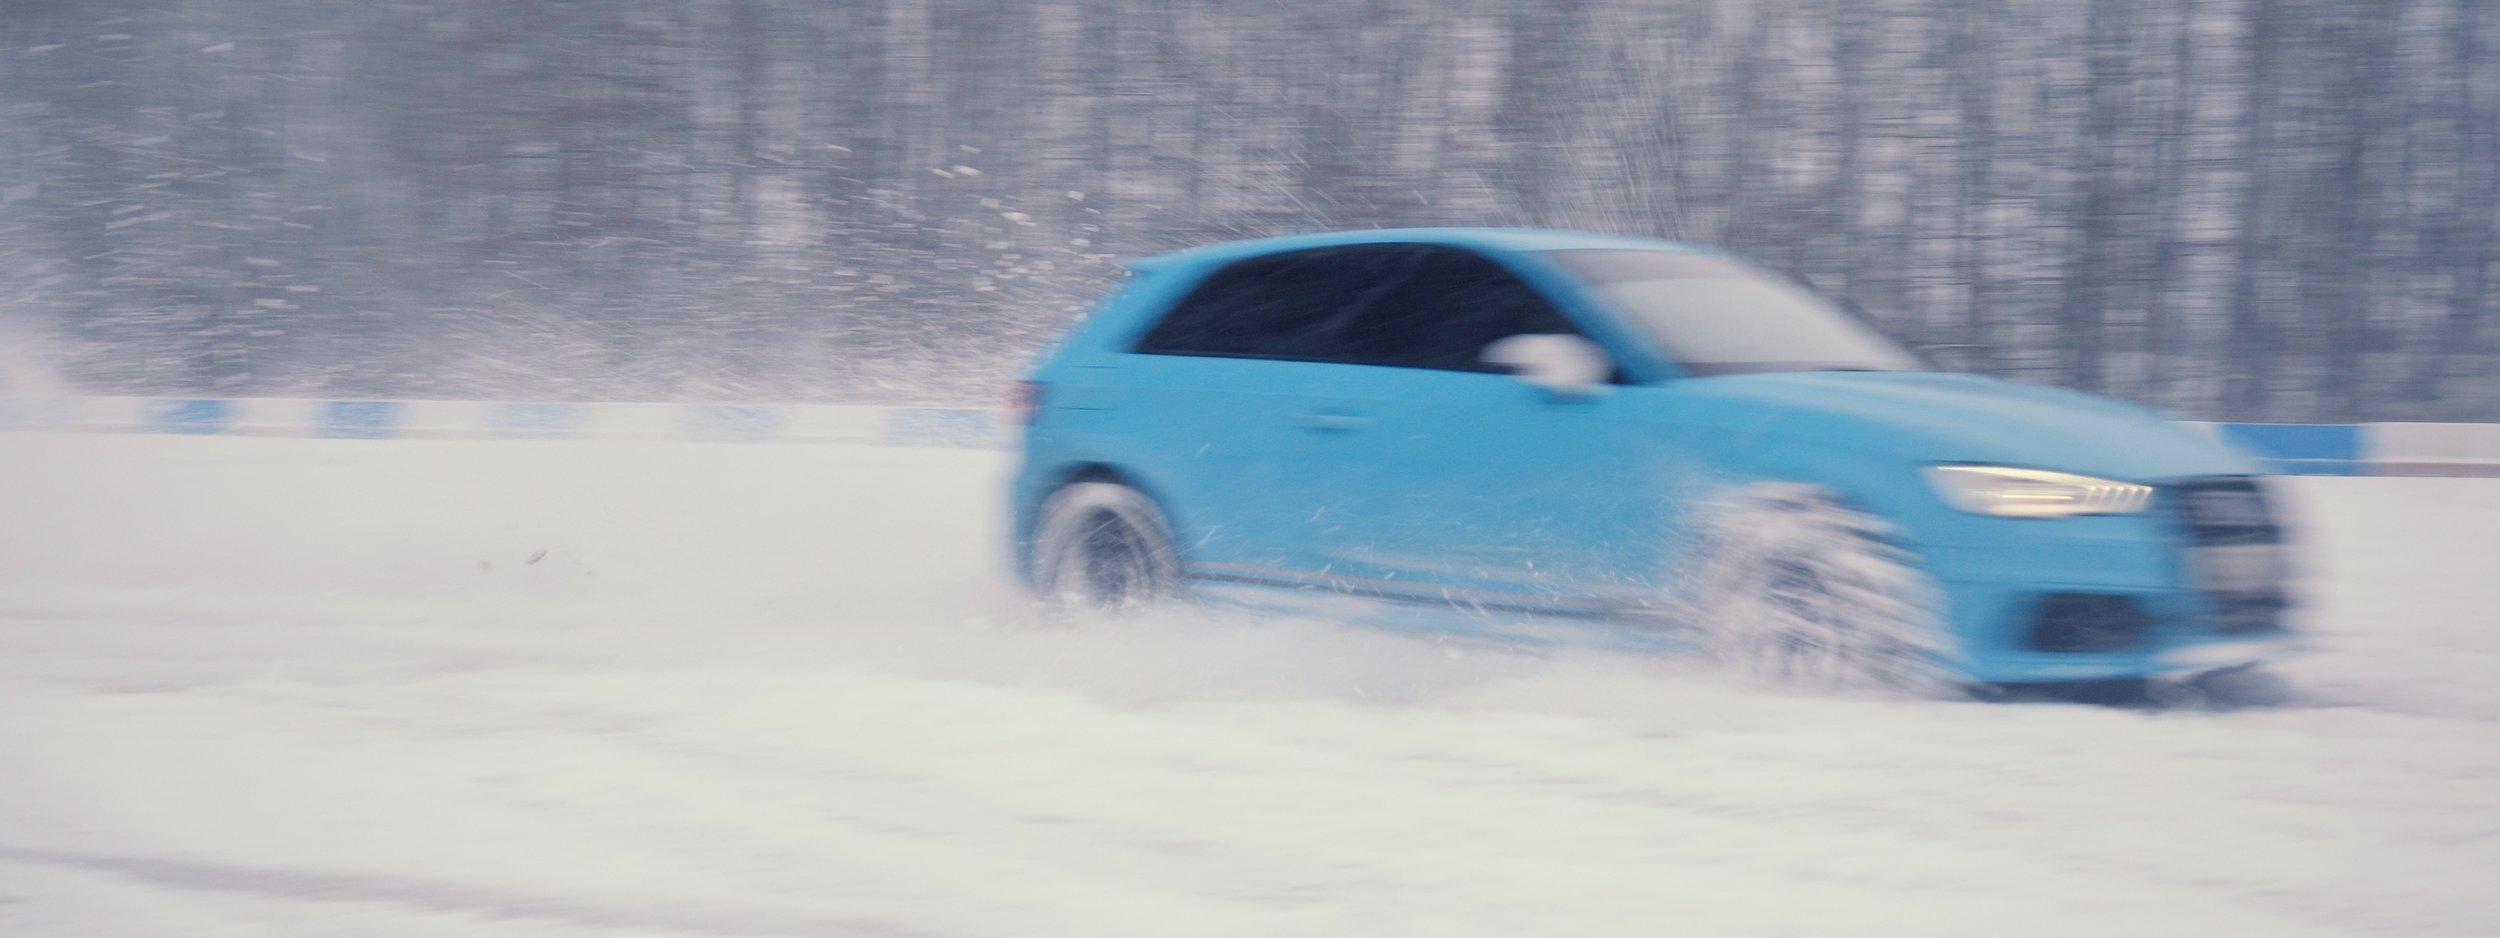 MMR AUDI S3 | SNOW DAY sc6.jpg